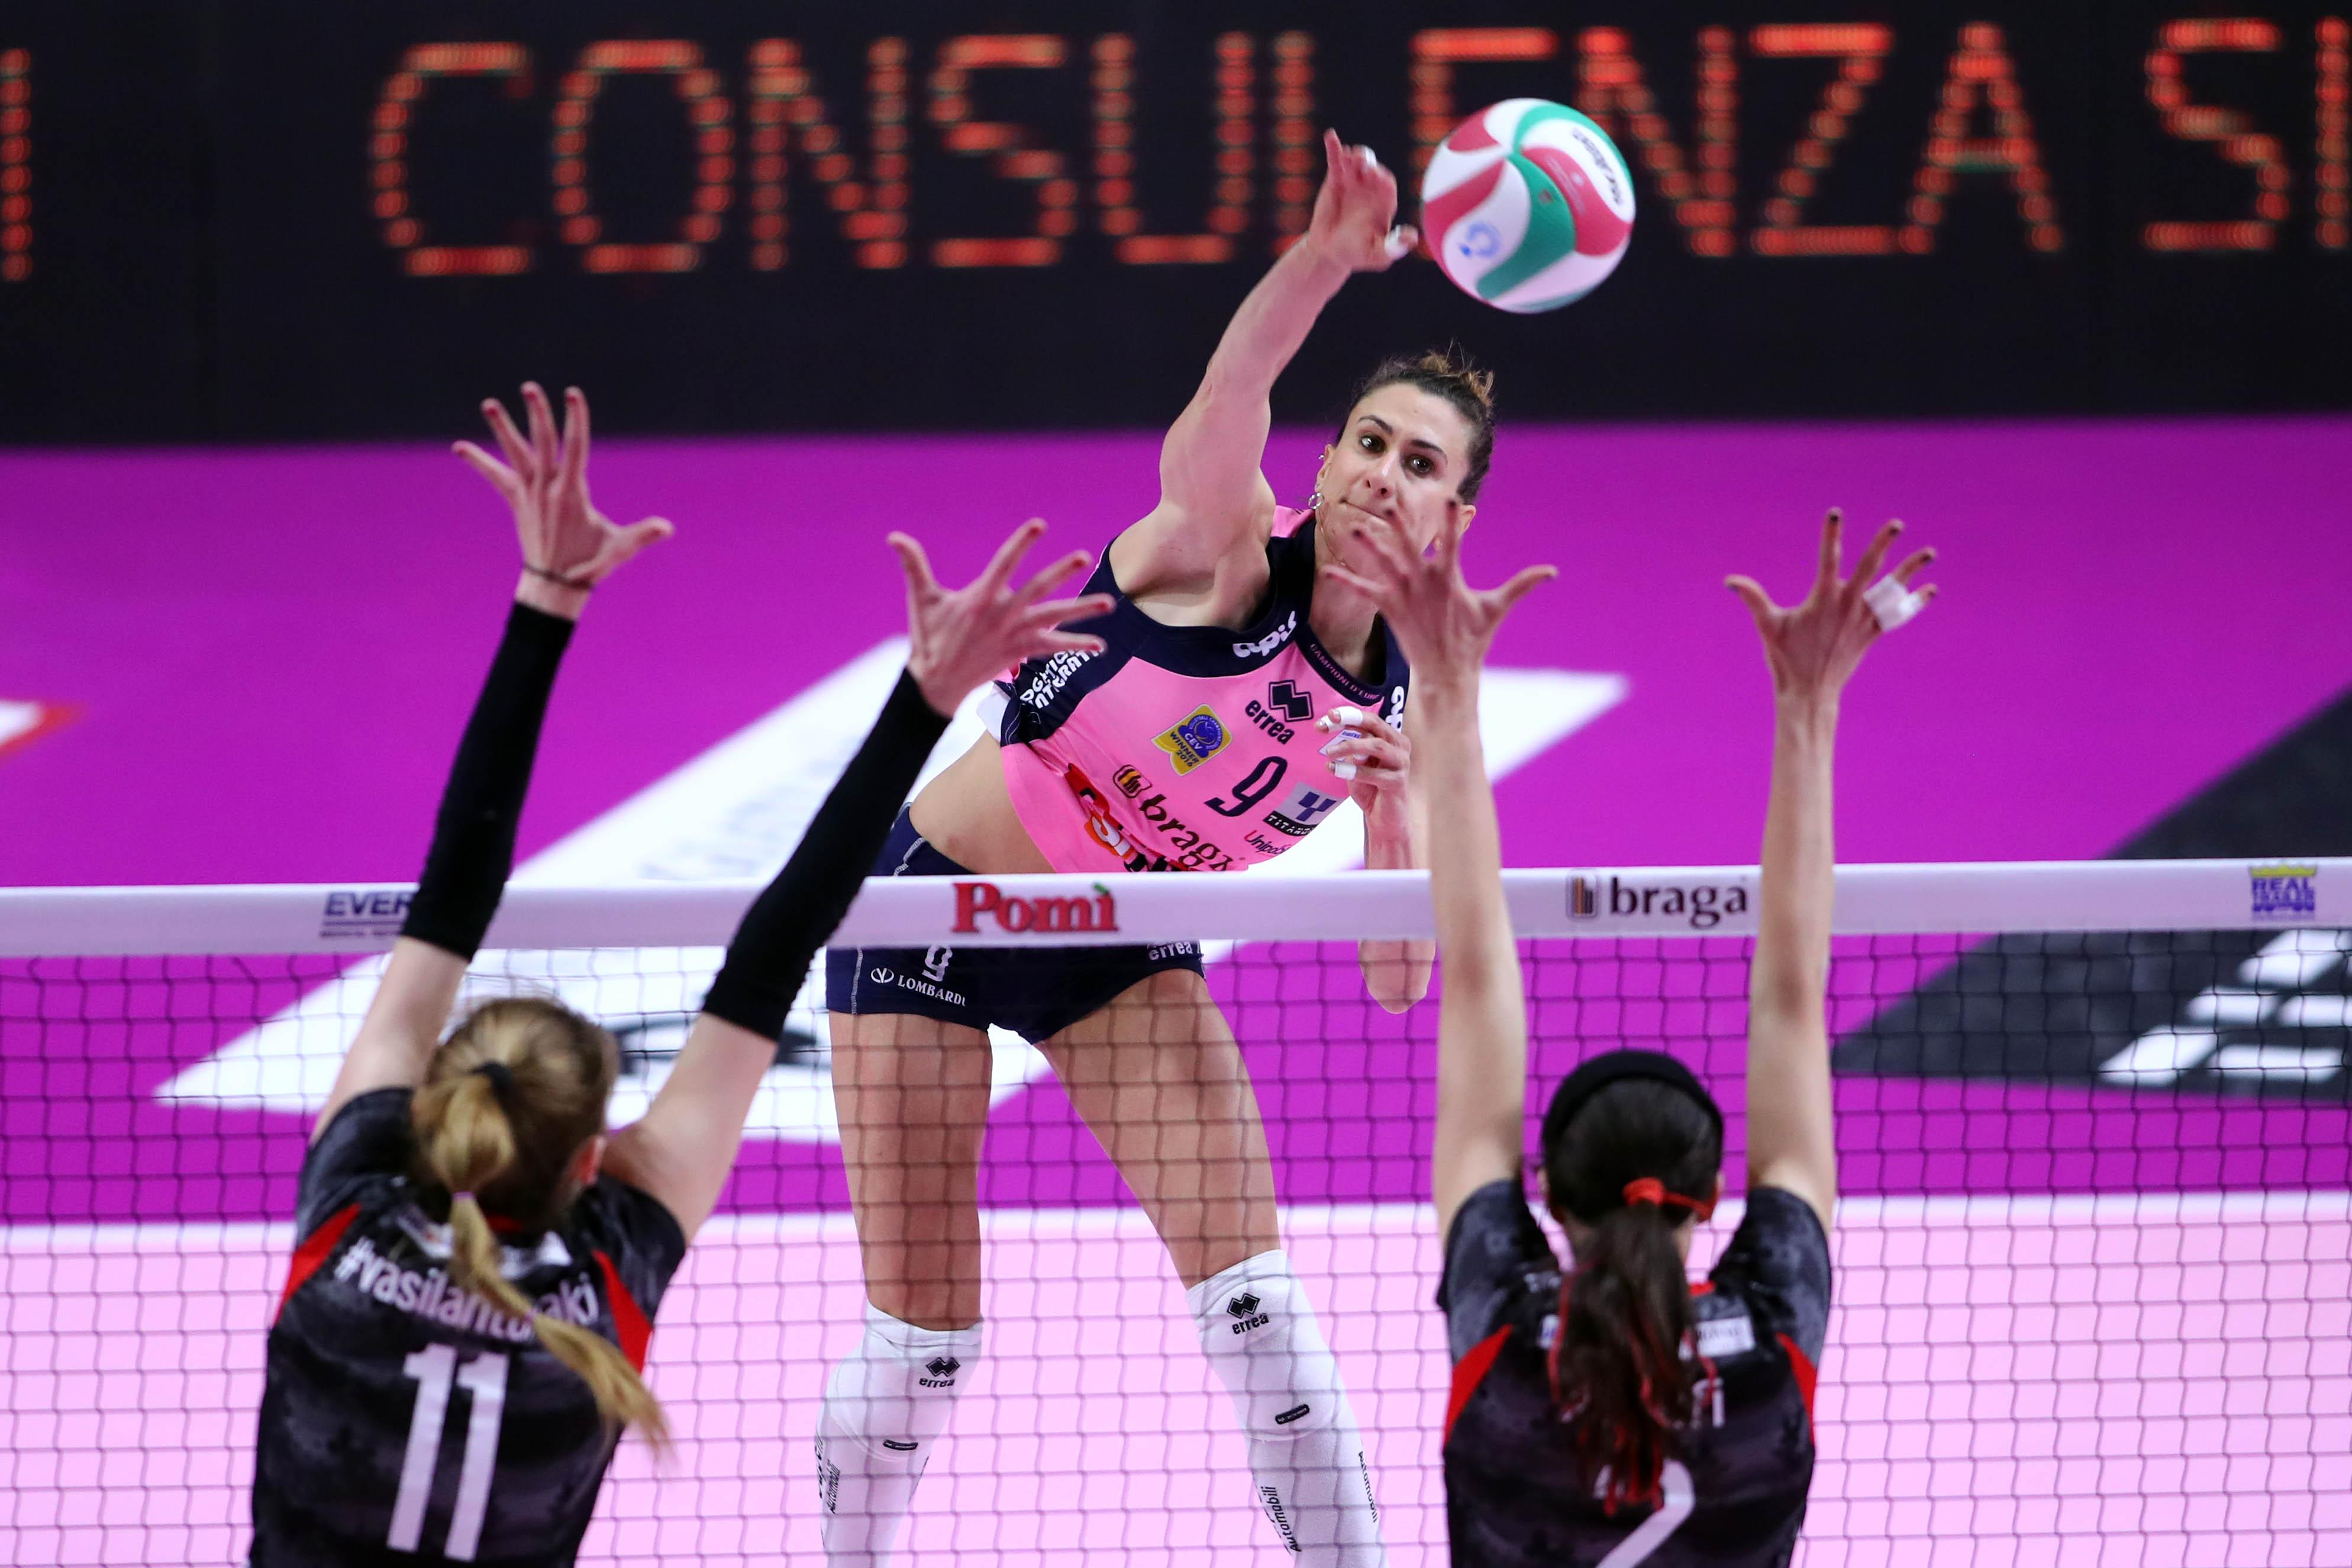 İtalya'da Son Yarı Finalist Pomi Casalmaggiore